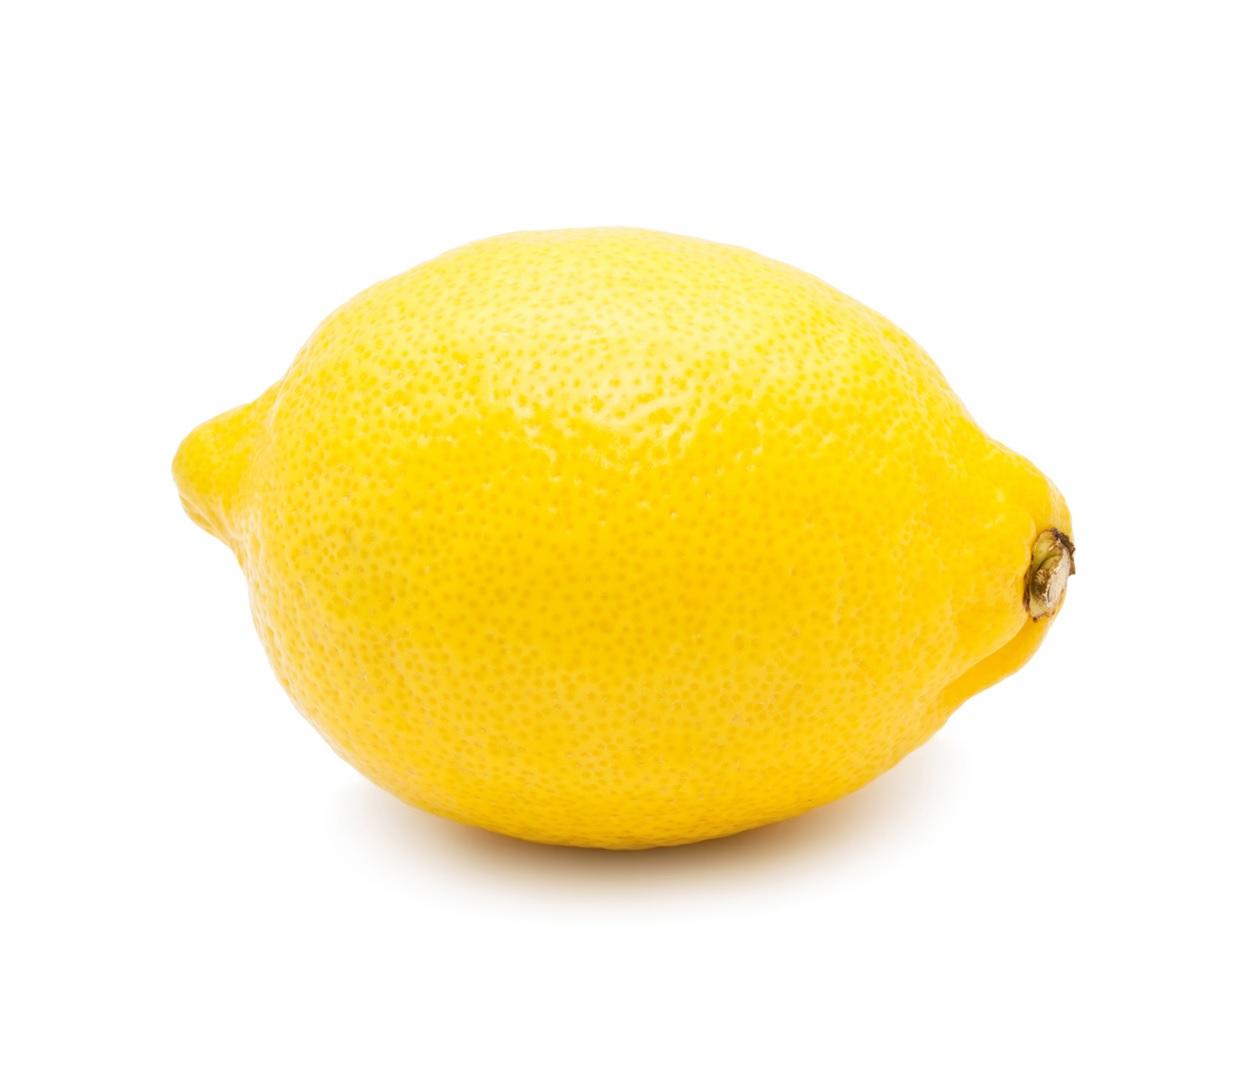 Citron KS odrůda Eureka velikost 5/6 (cca 80-100g)